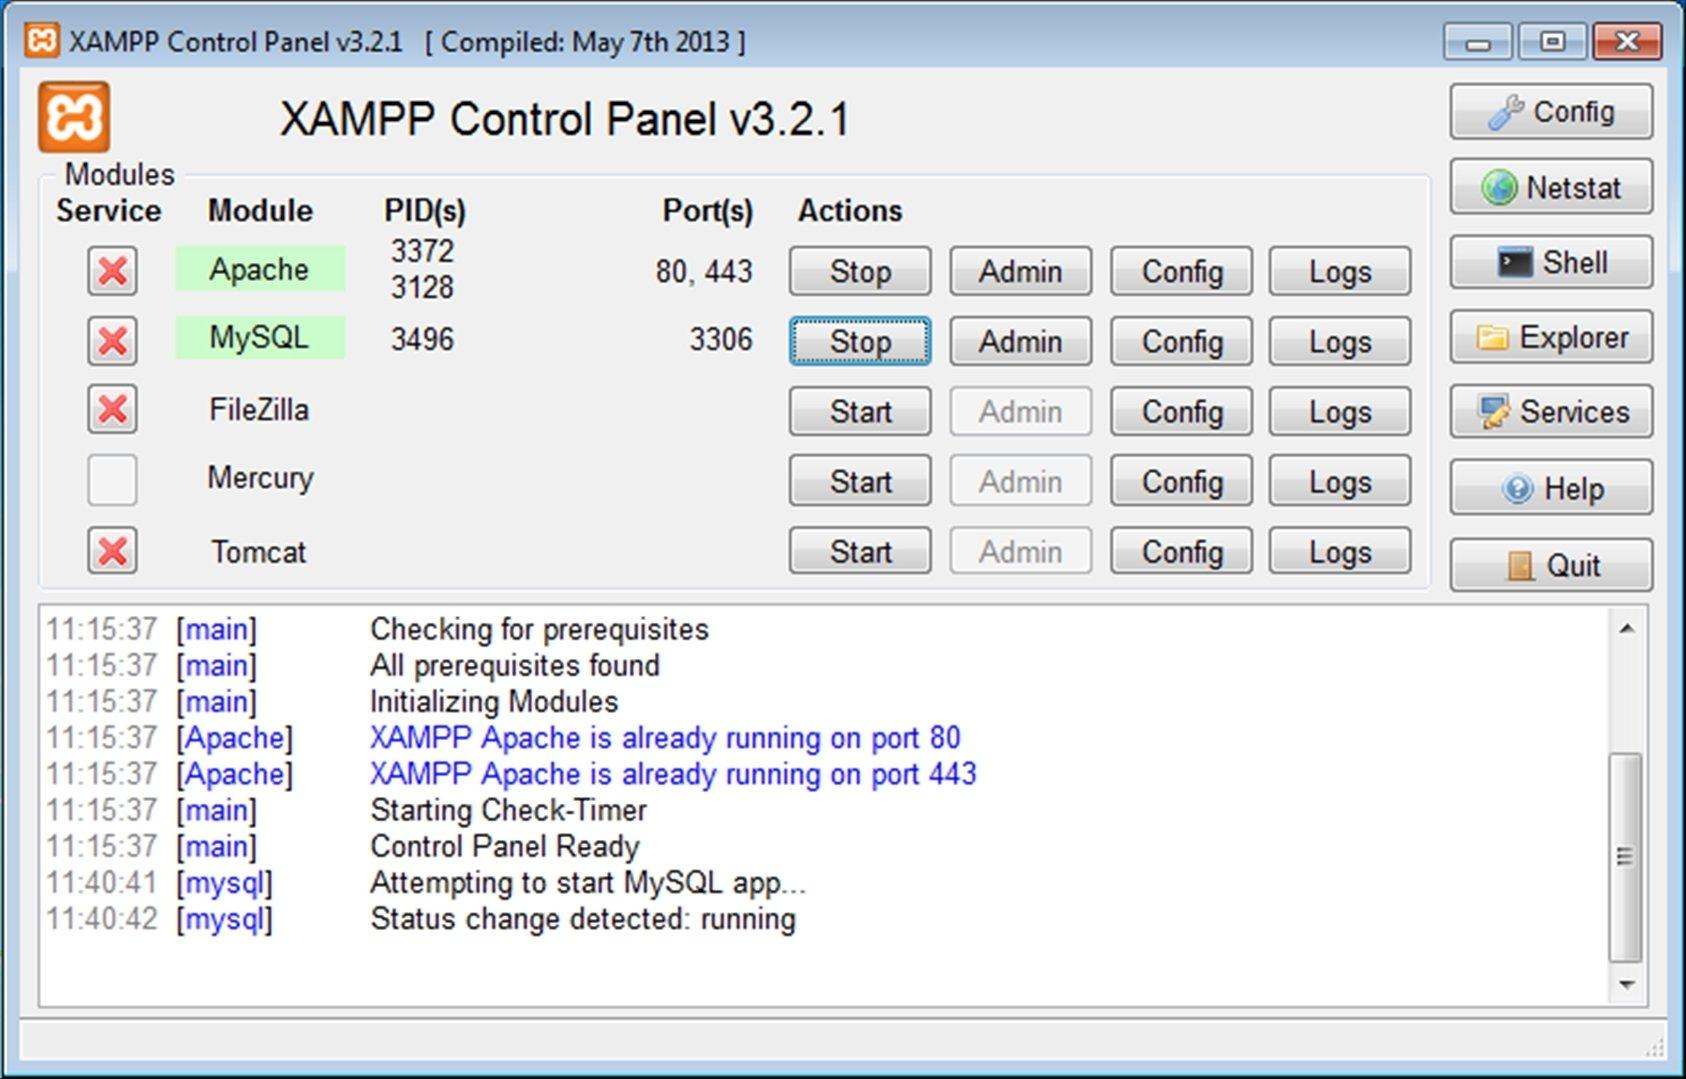 XAMPP 5.6.3